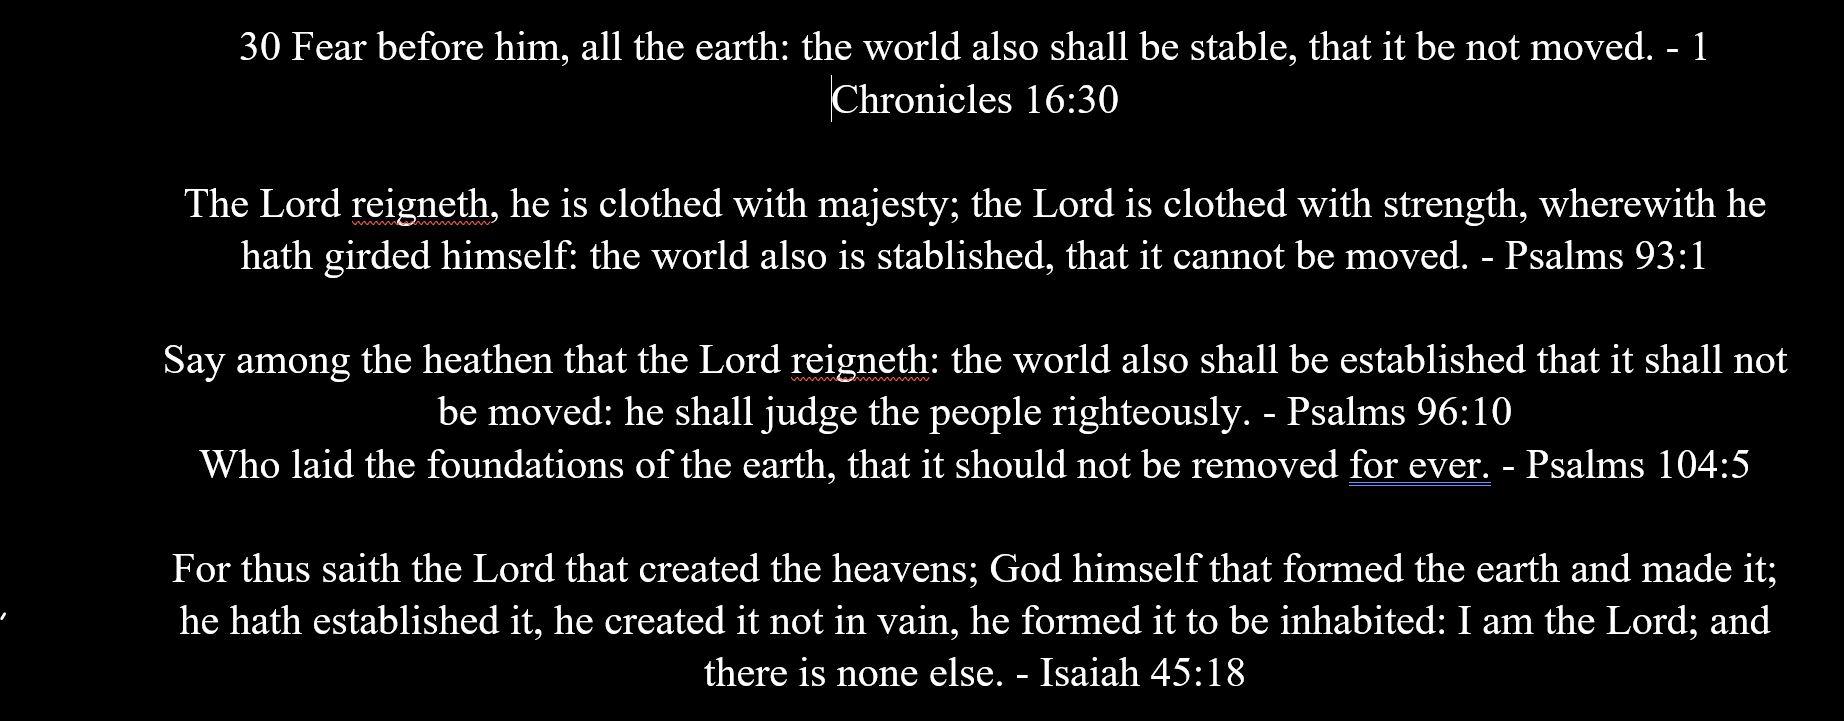 Zen Garcia Vs. Globe Earth: The Key to Unlocking the True Cosmology